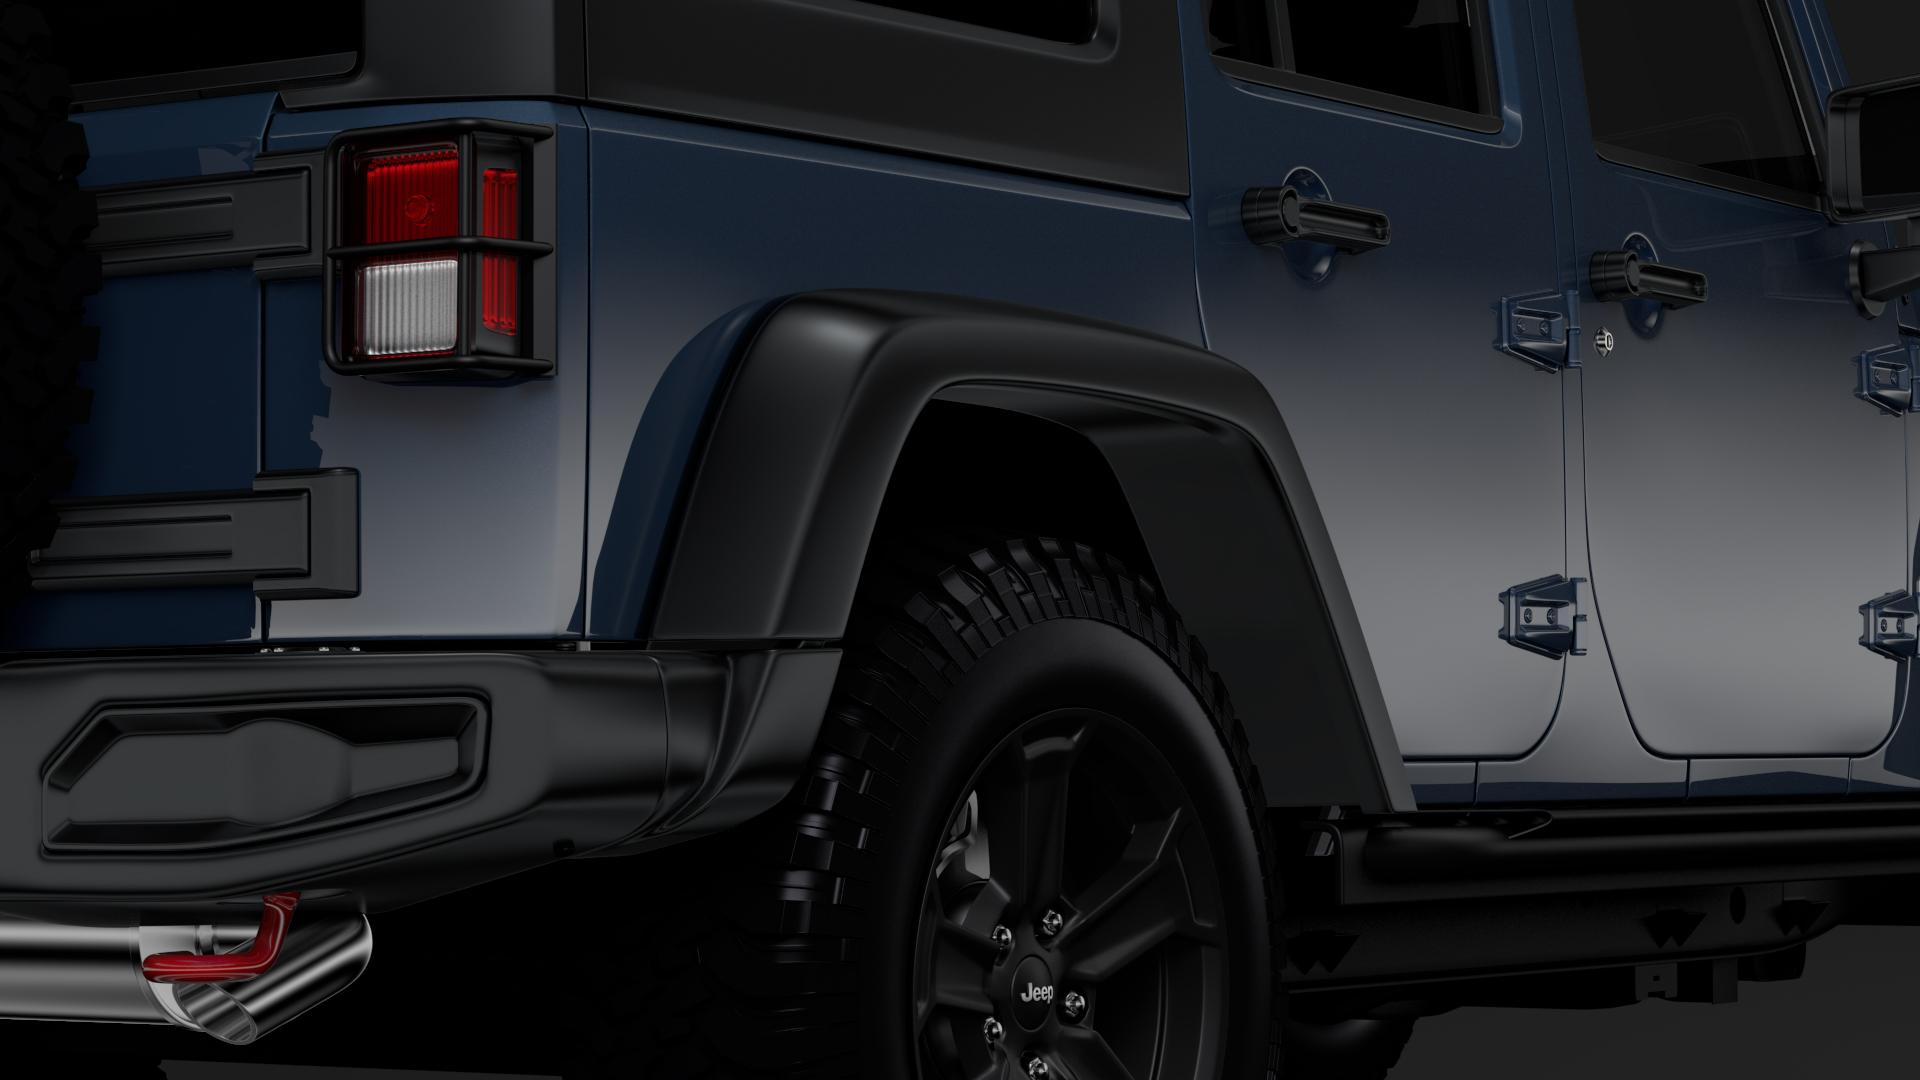 jeep wrangler unlimited rubicon recon jk 2017 3d model max fbx c4d lwo ma mb hrc xsi obj 277009